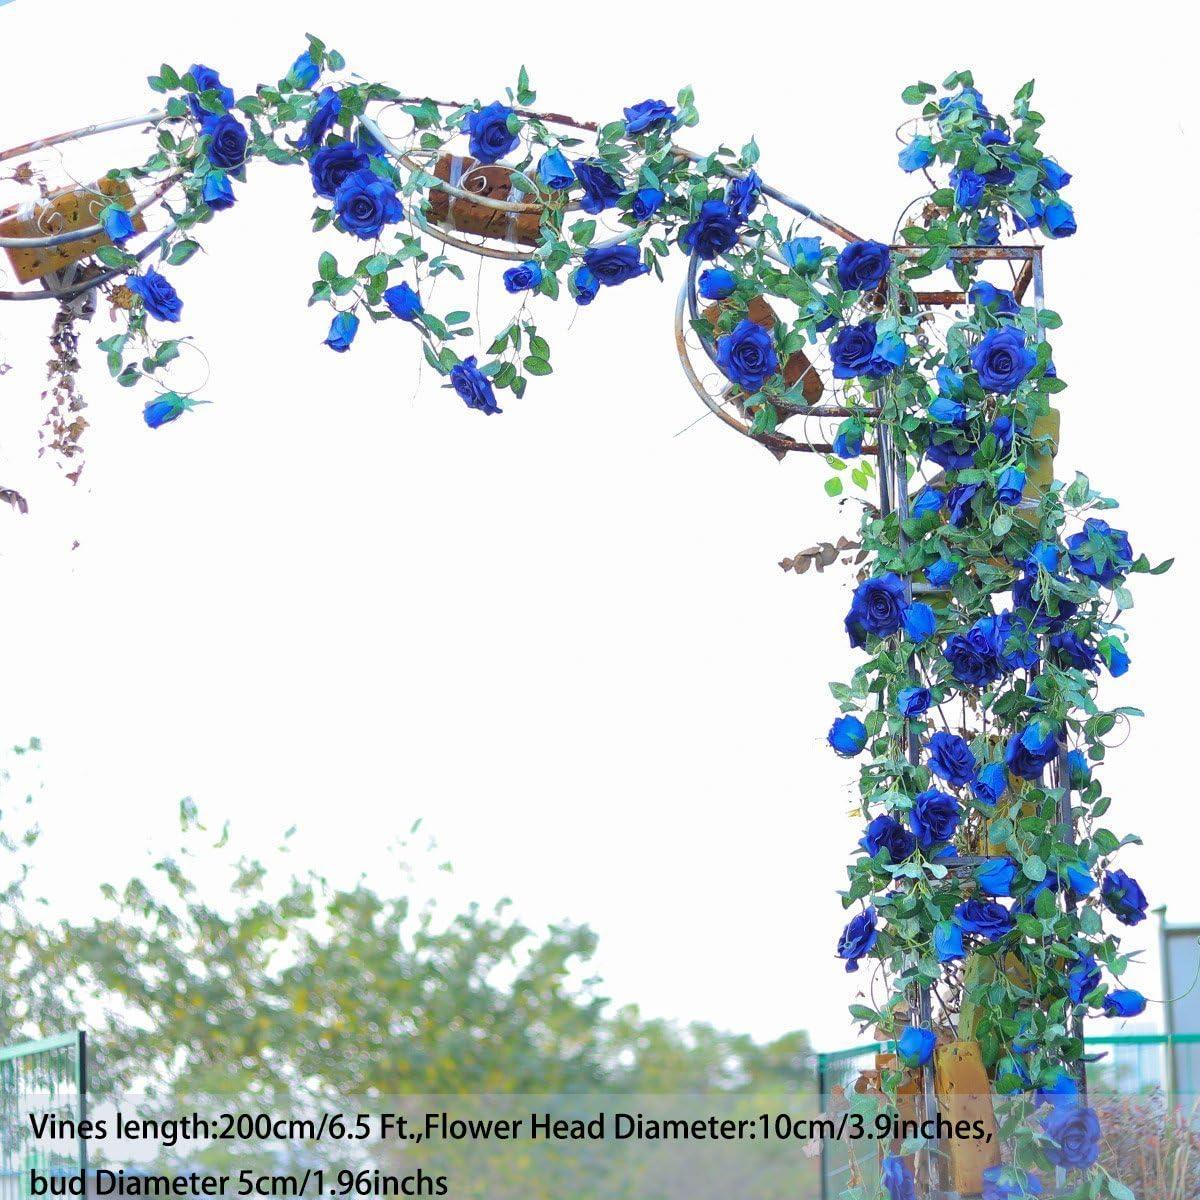 PARTY JOY Flower Garland Fake Rose Vine Artificial Flowers Hanging Rose Ivy Hanging Baskets Wedding Arch Garden Background Decor 2, 69T Red